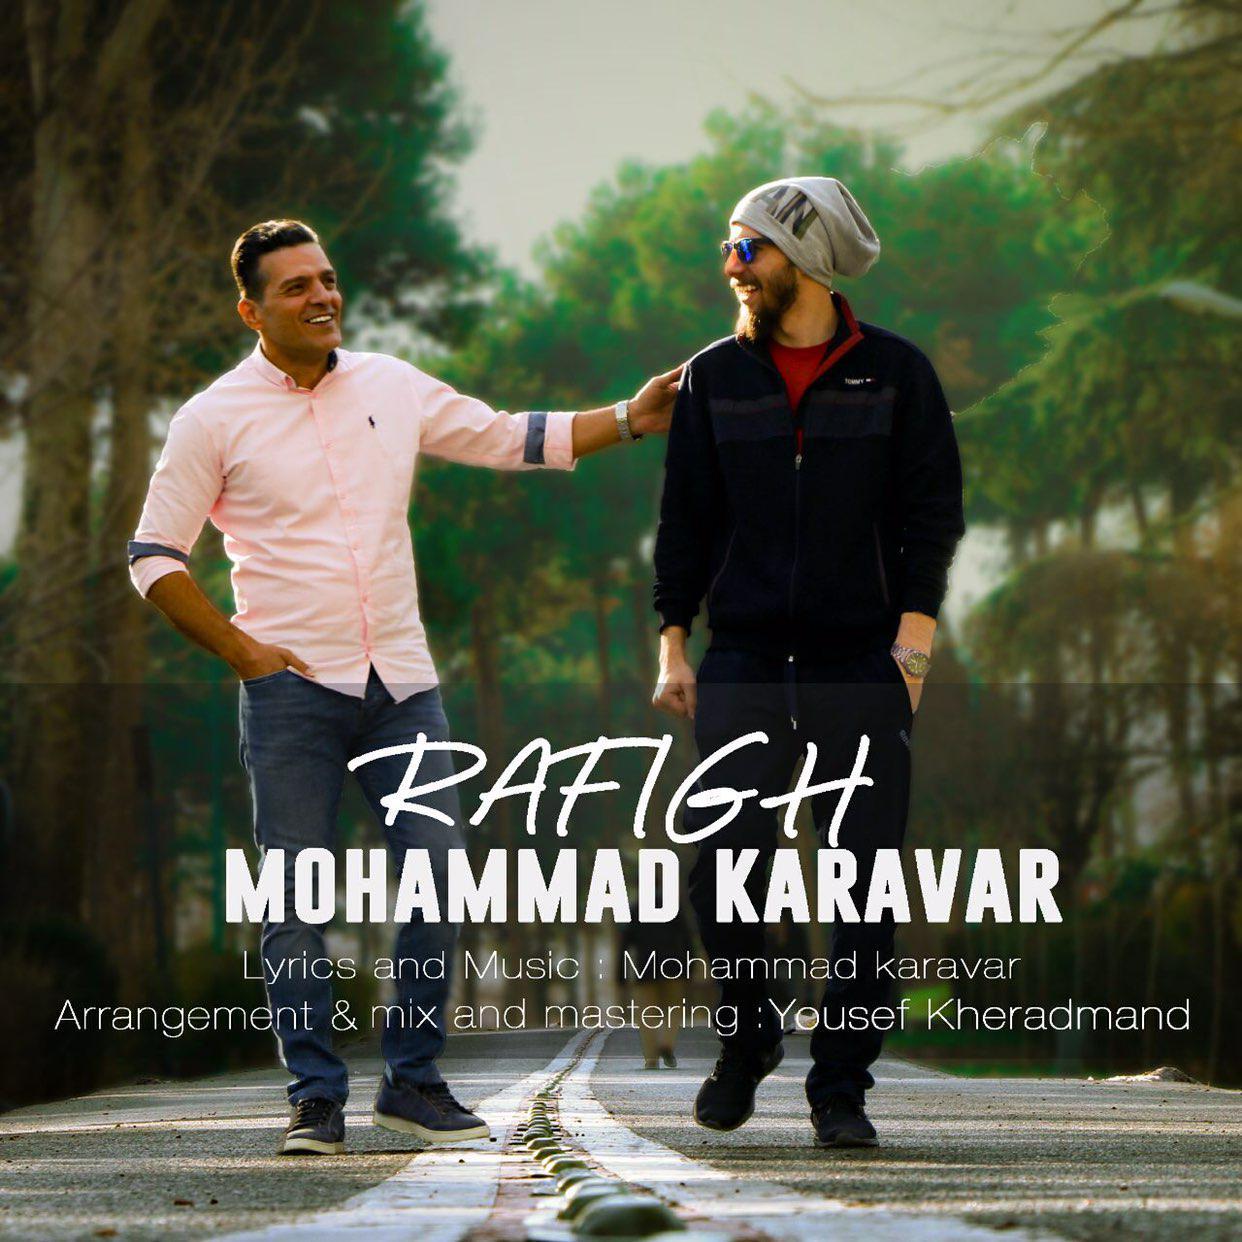 Mohammad Karavar – Rafigh